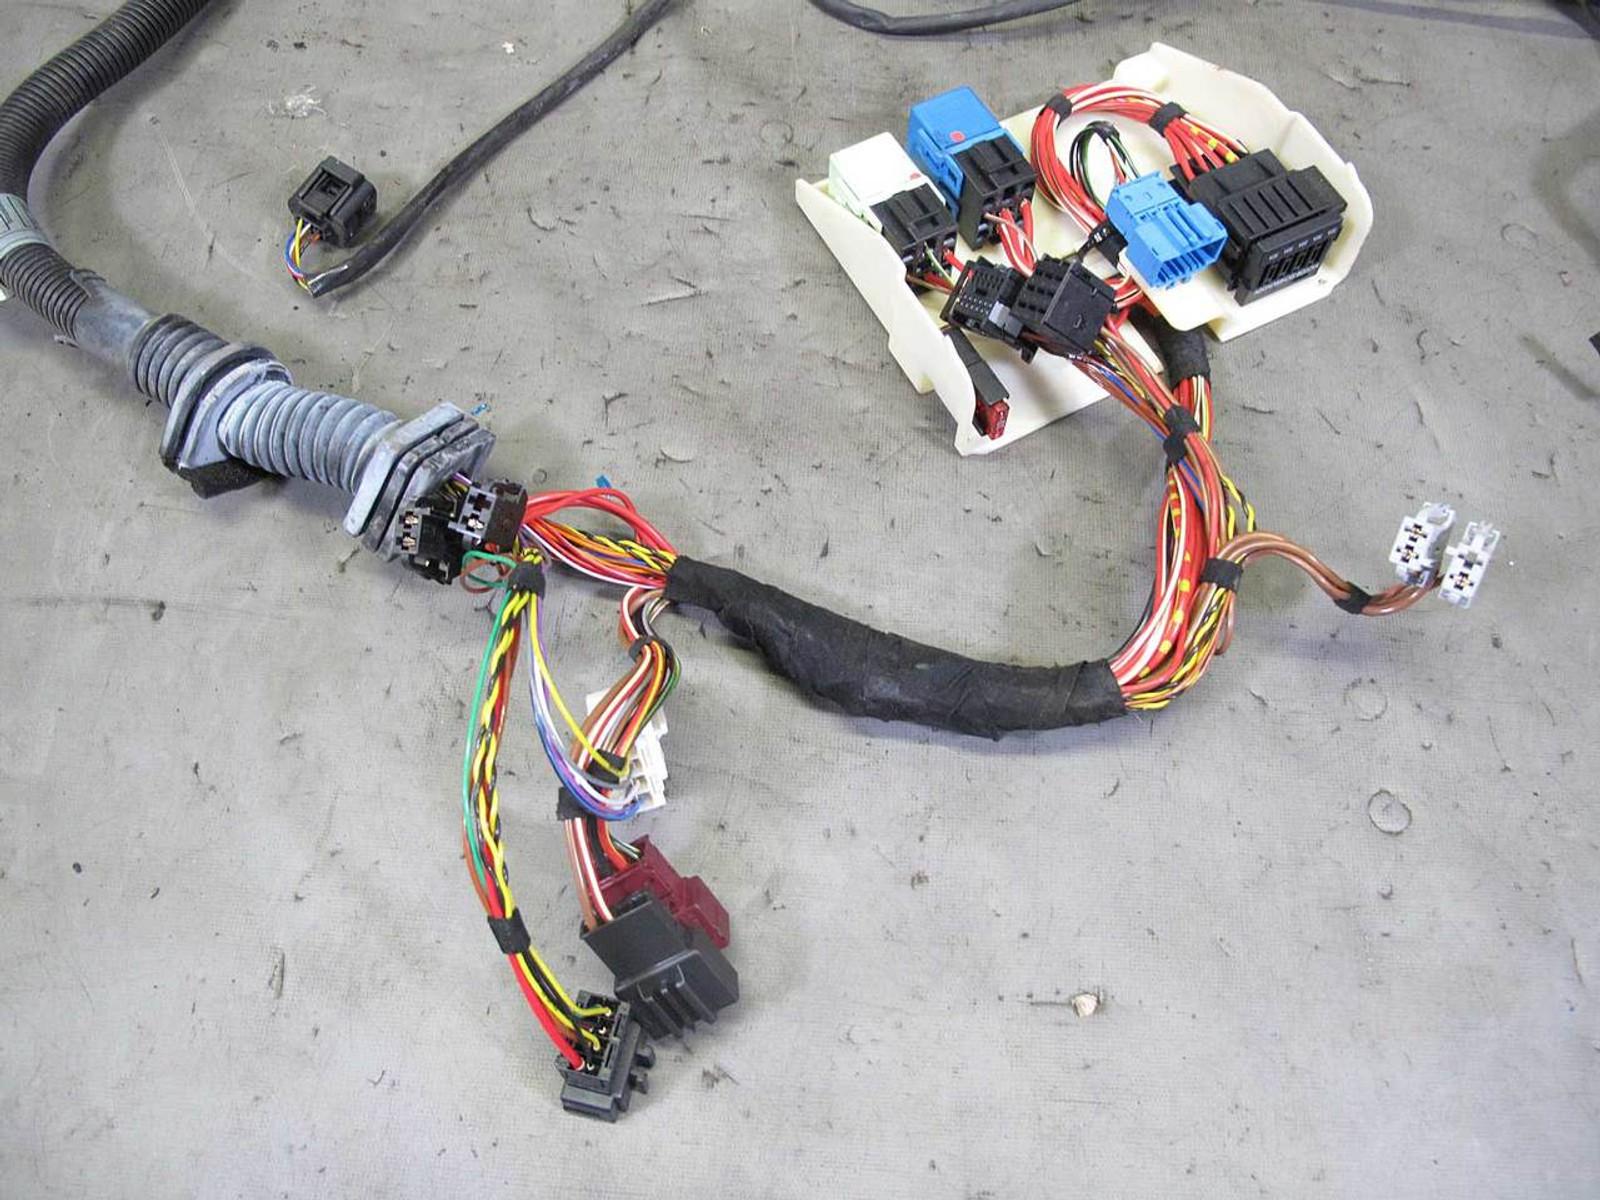 2004 2005 bmw e60 5 series m54 6cyl automatic transmission wiring bmw e60 transmission wire harness [ 1280 x 960 Pixel ]